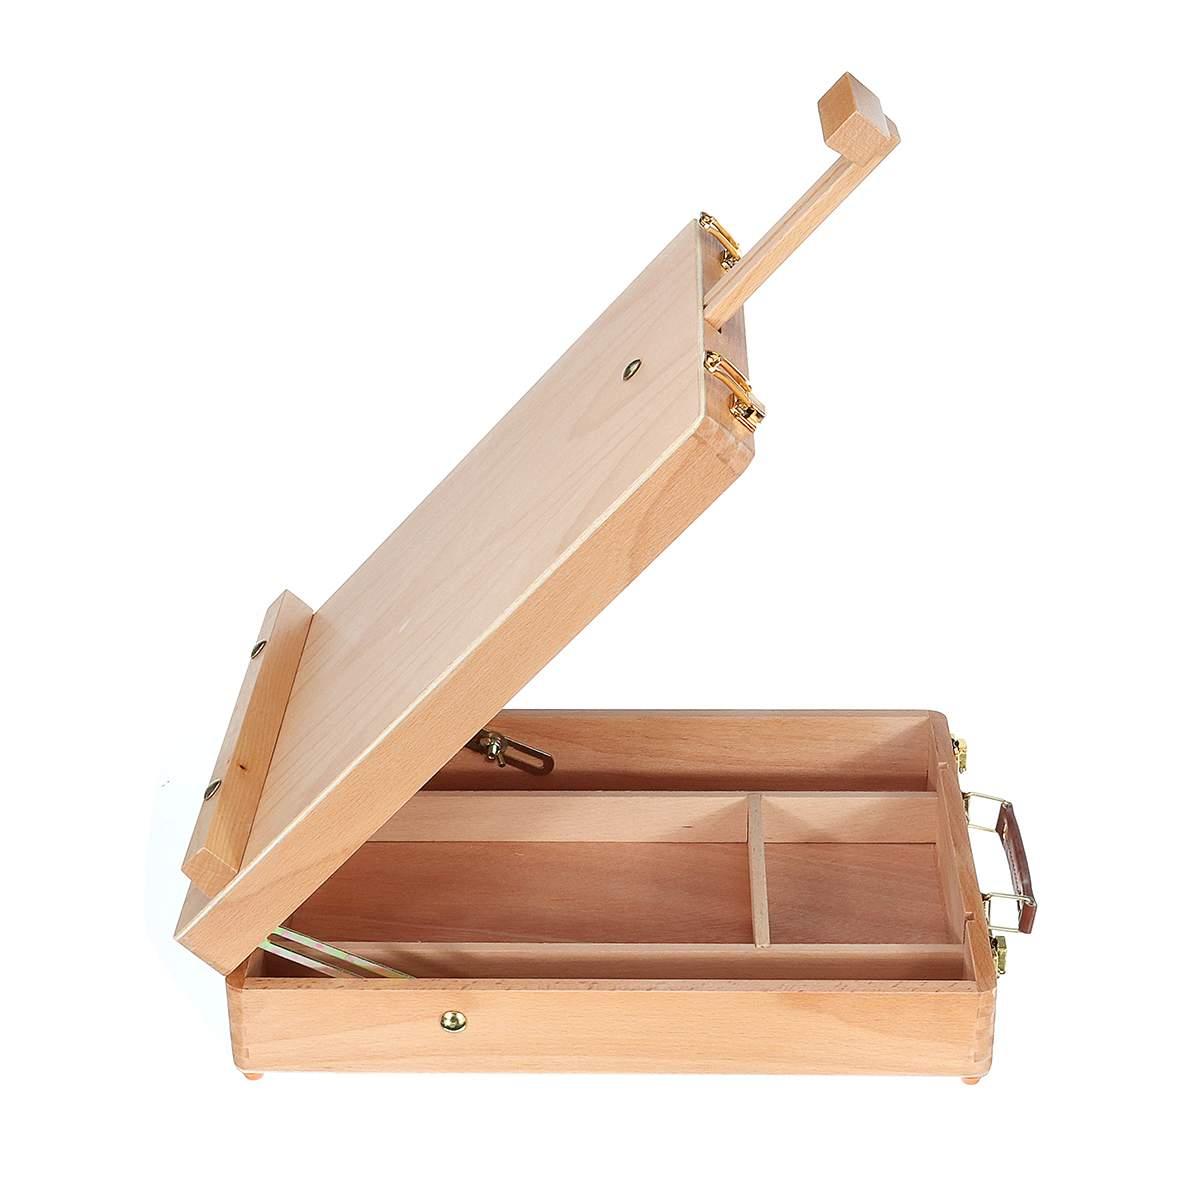 integrada arte desenho pintura mesa caixa de